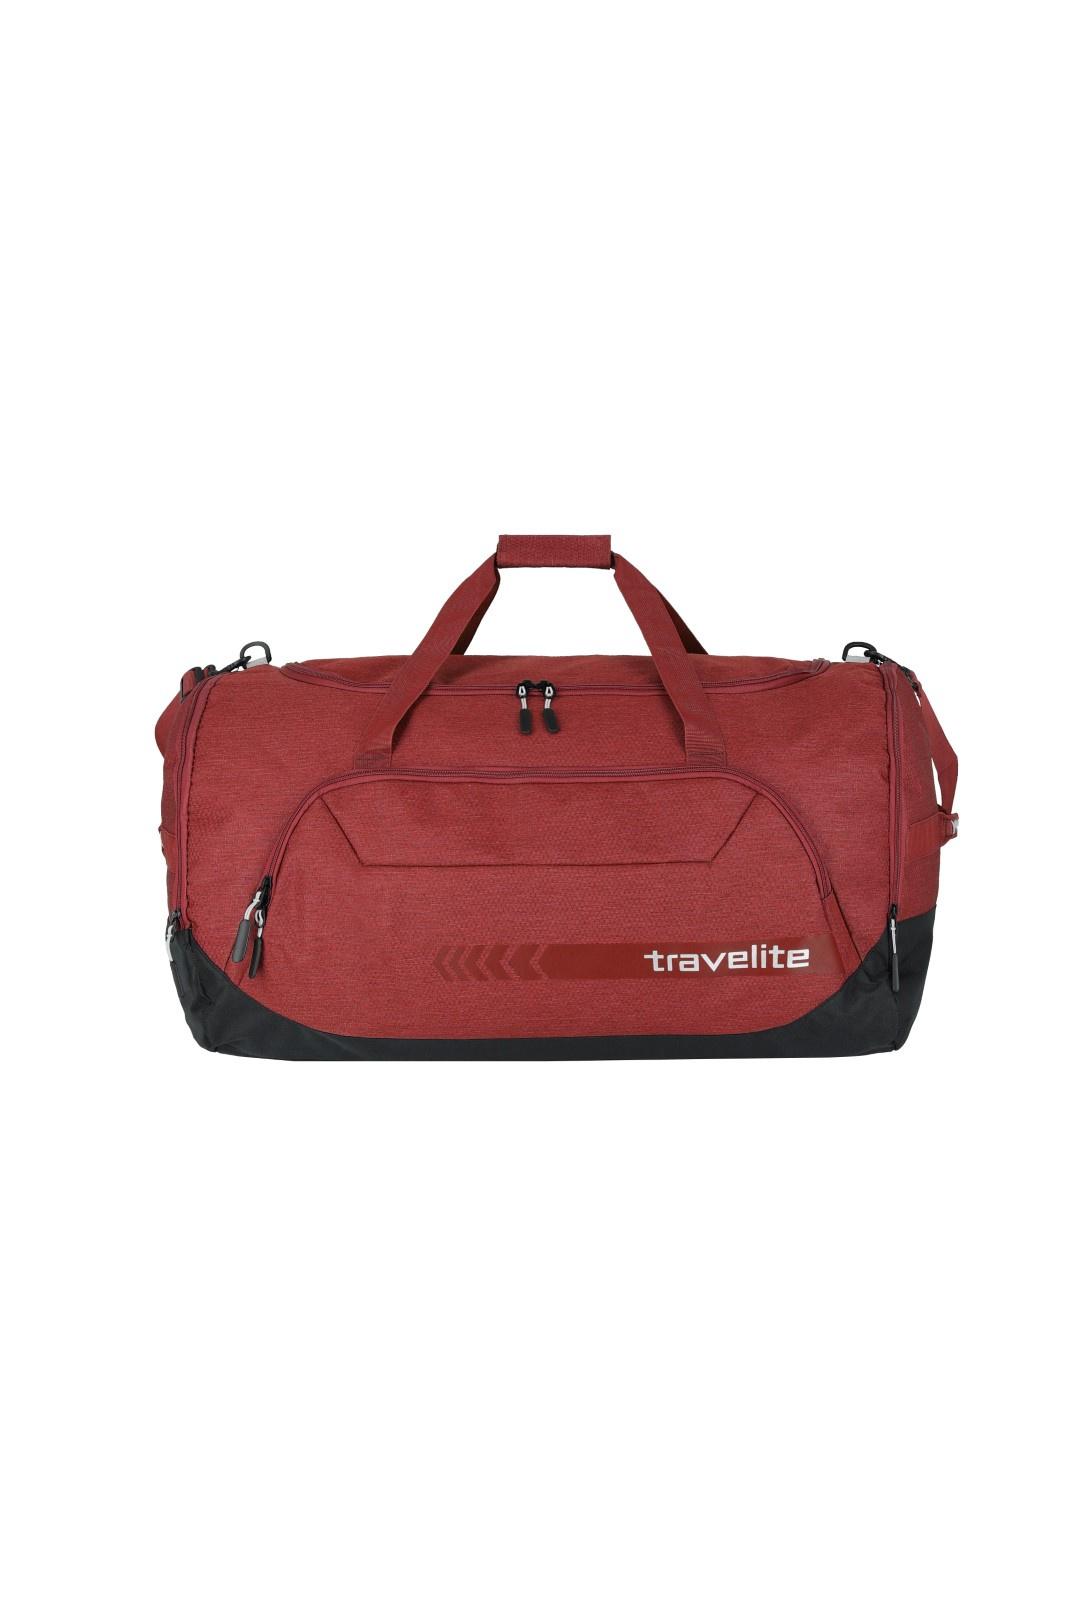 Travelite KICK OFF Duffle XL 006916 Red